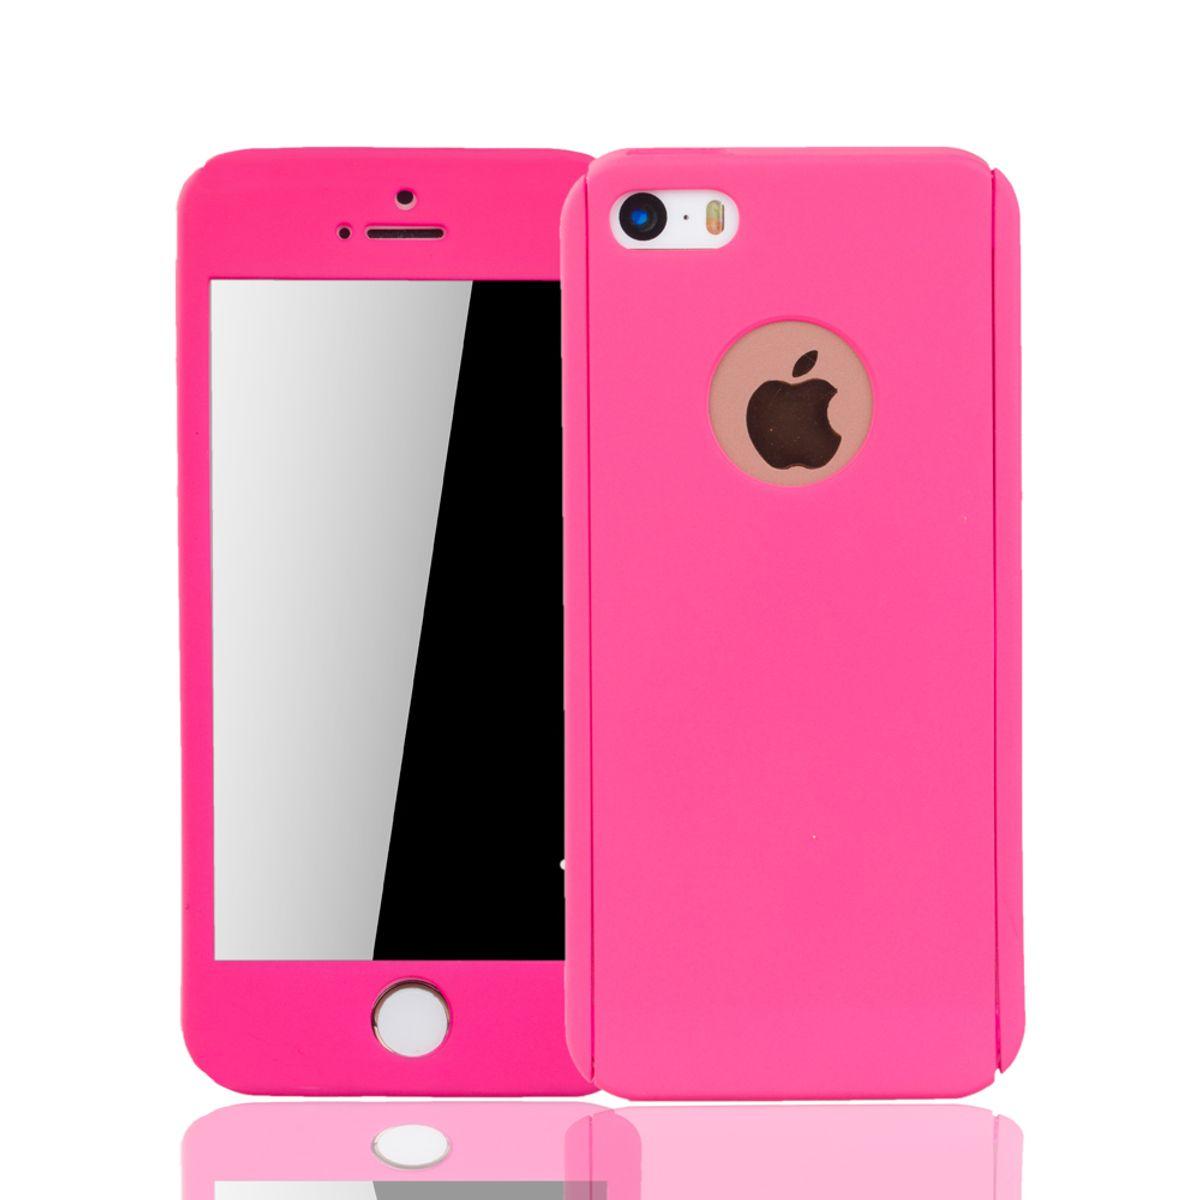 apple iphone 5 5s handy h lle schutz case cover panzer. Black Bedroom Furniture Sets. Home Design Ideas